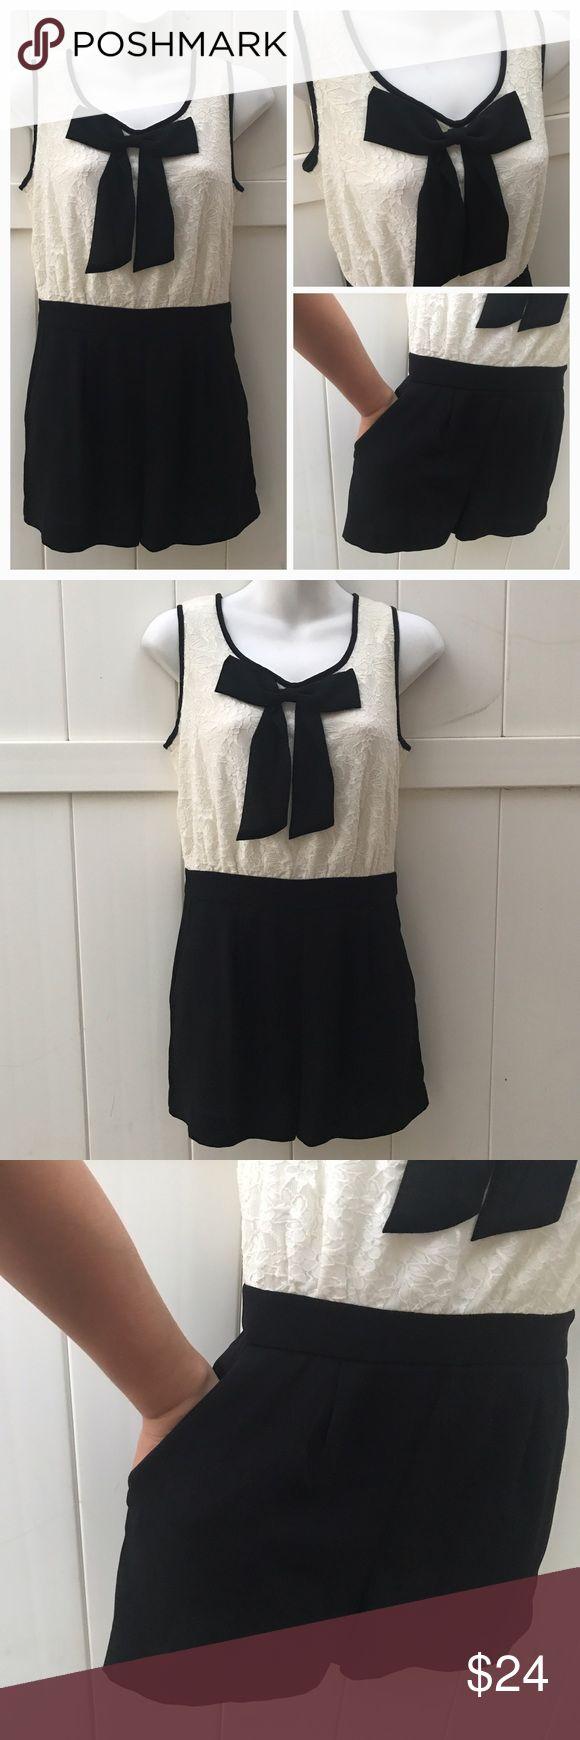 Forever 21 black and white romper sz Small Forever 21 black and white romper sz Small/ no flaws Forever 21 Dresses